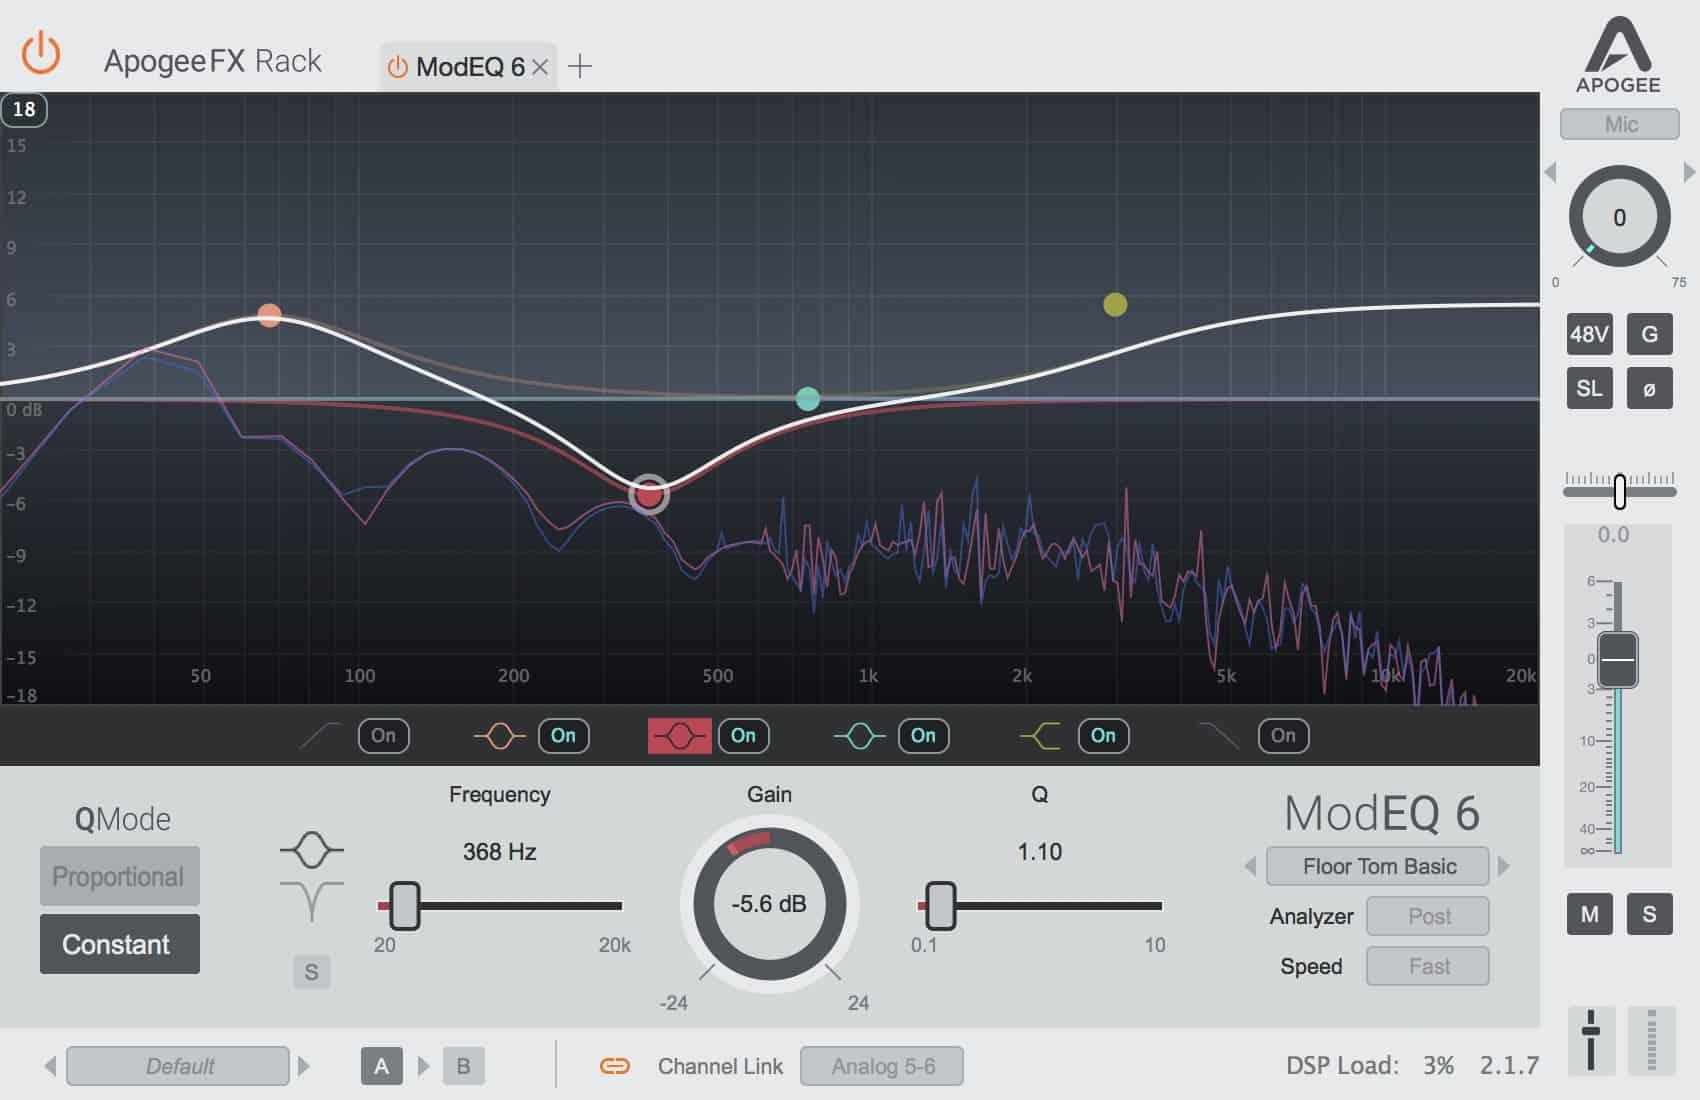 Apogee Filter ModEQ6